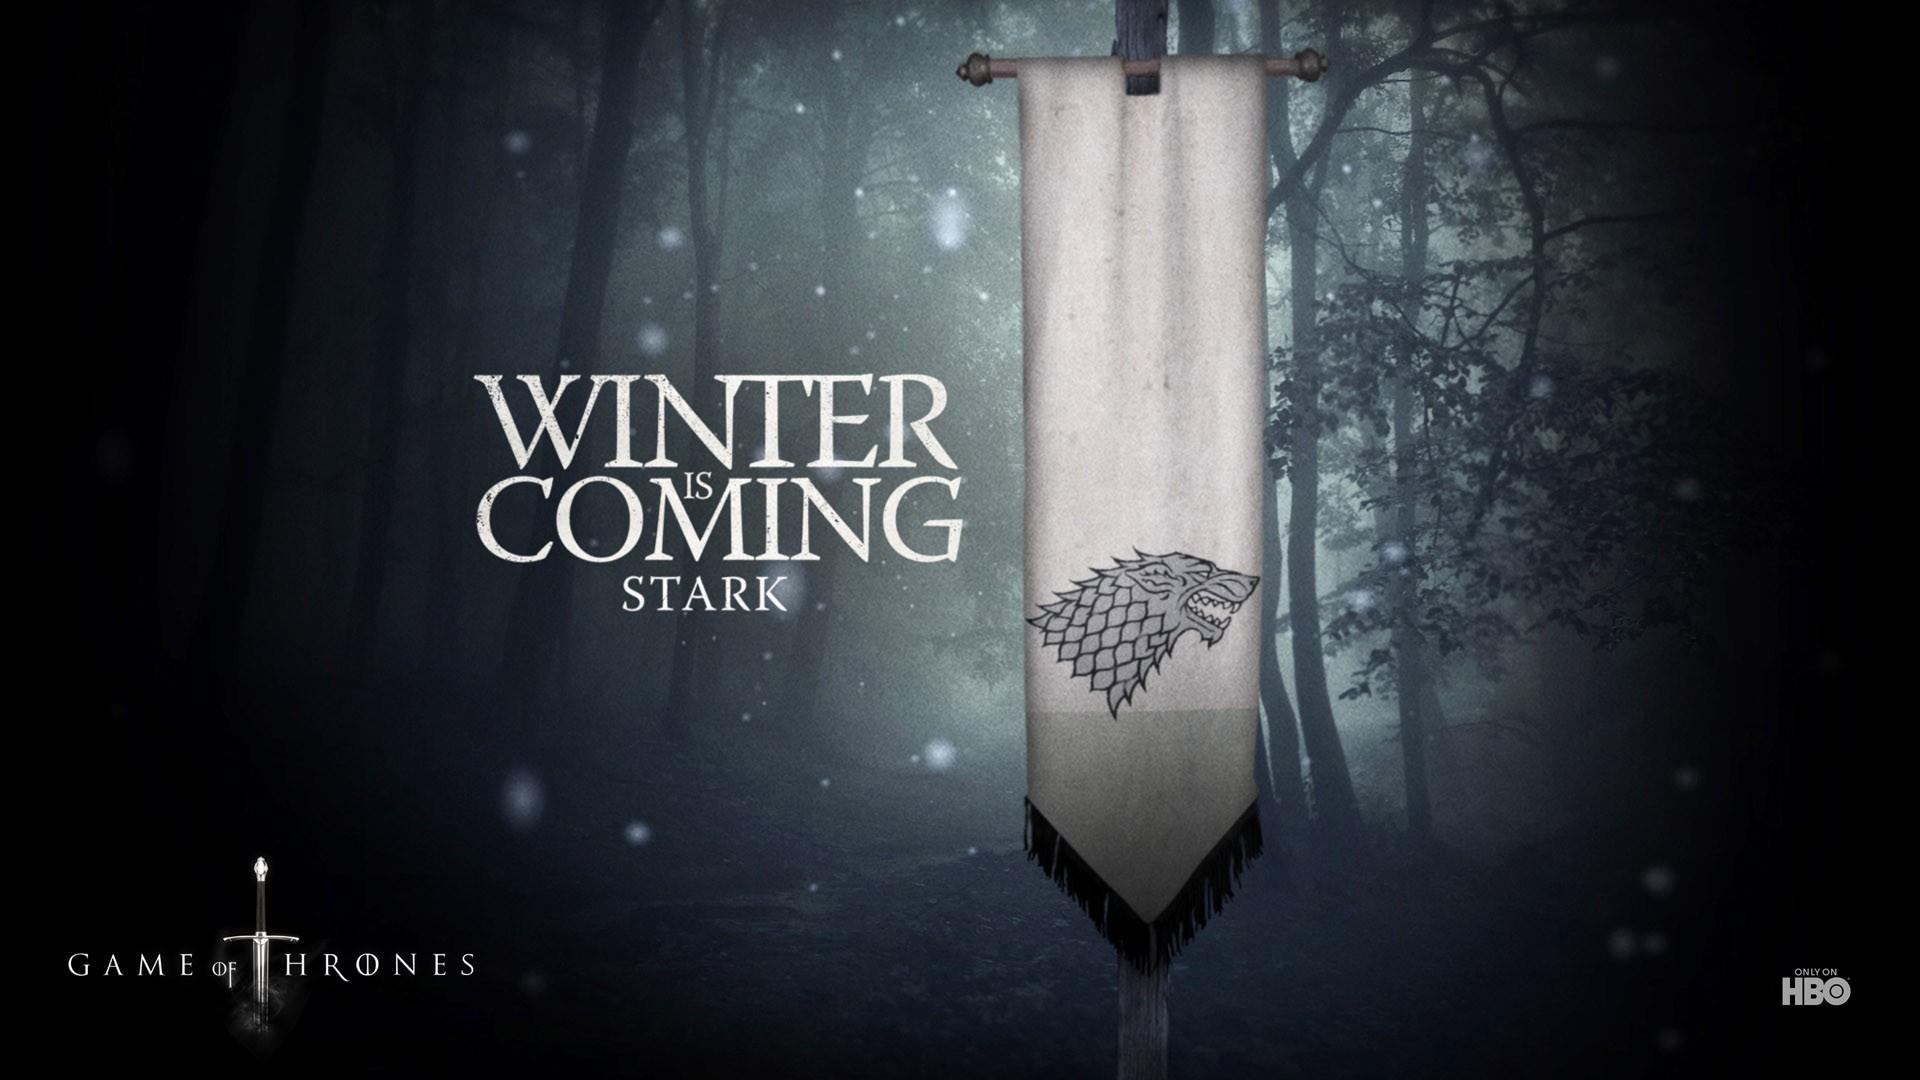 Winter is coming hd wallpaper wallpapersafari Got online hd